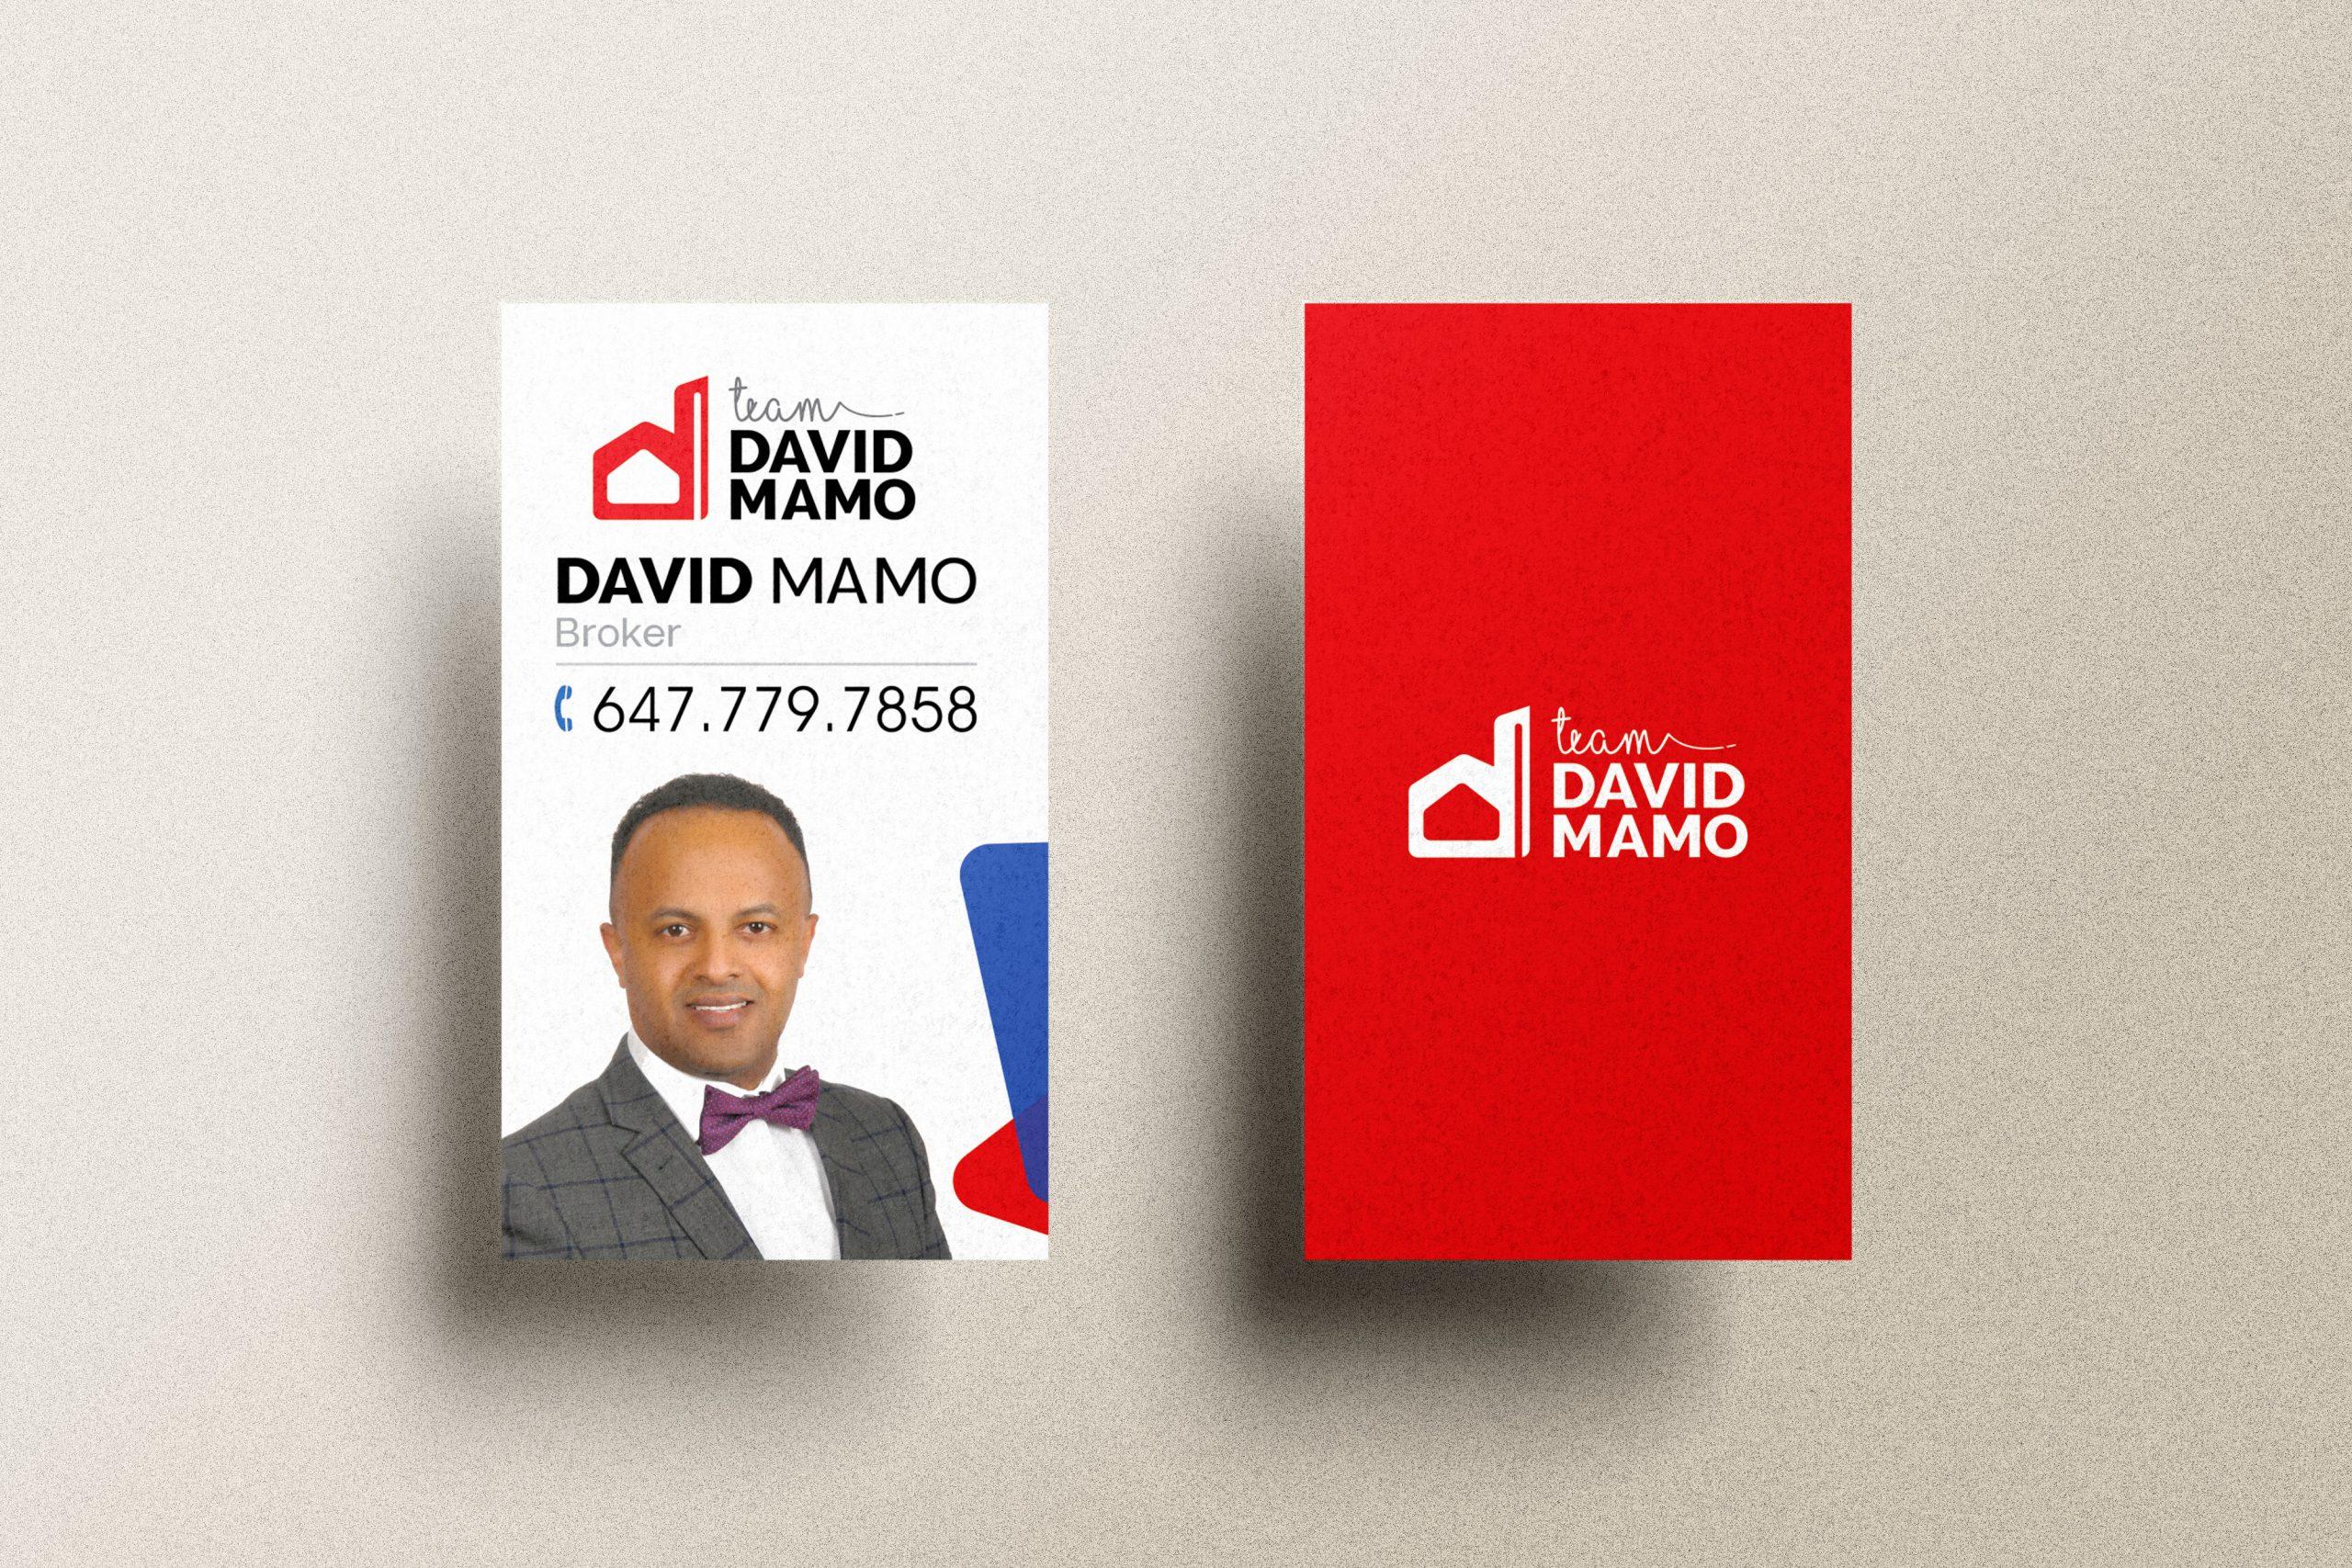 David Mamo